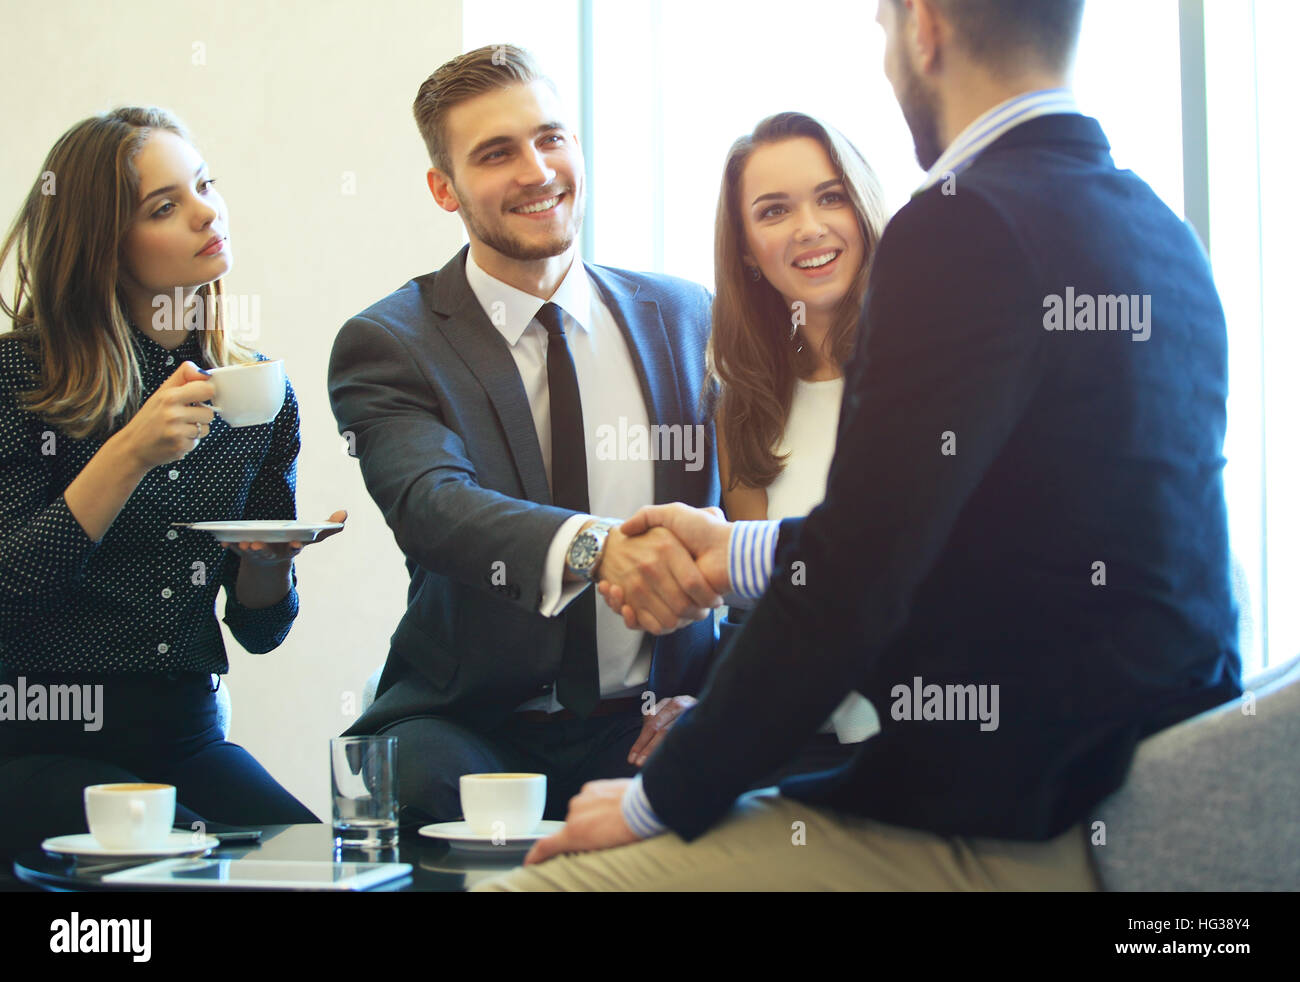 Geschäftsleute, Händeschütteln, finishing ein treffen. Stockbild